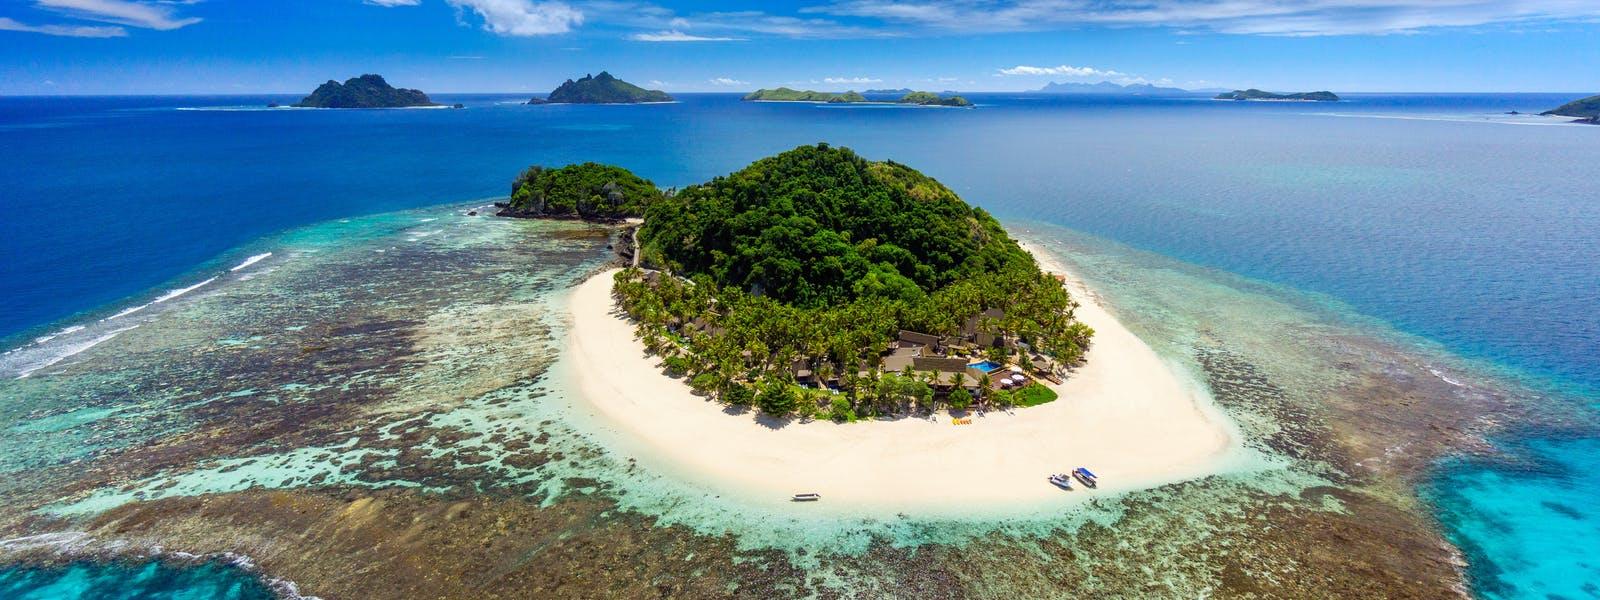 Matamanoa-Island-Fiji